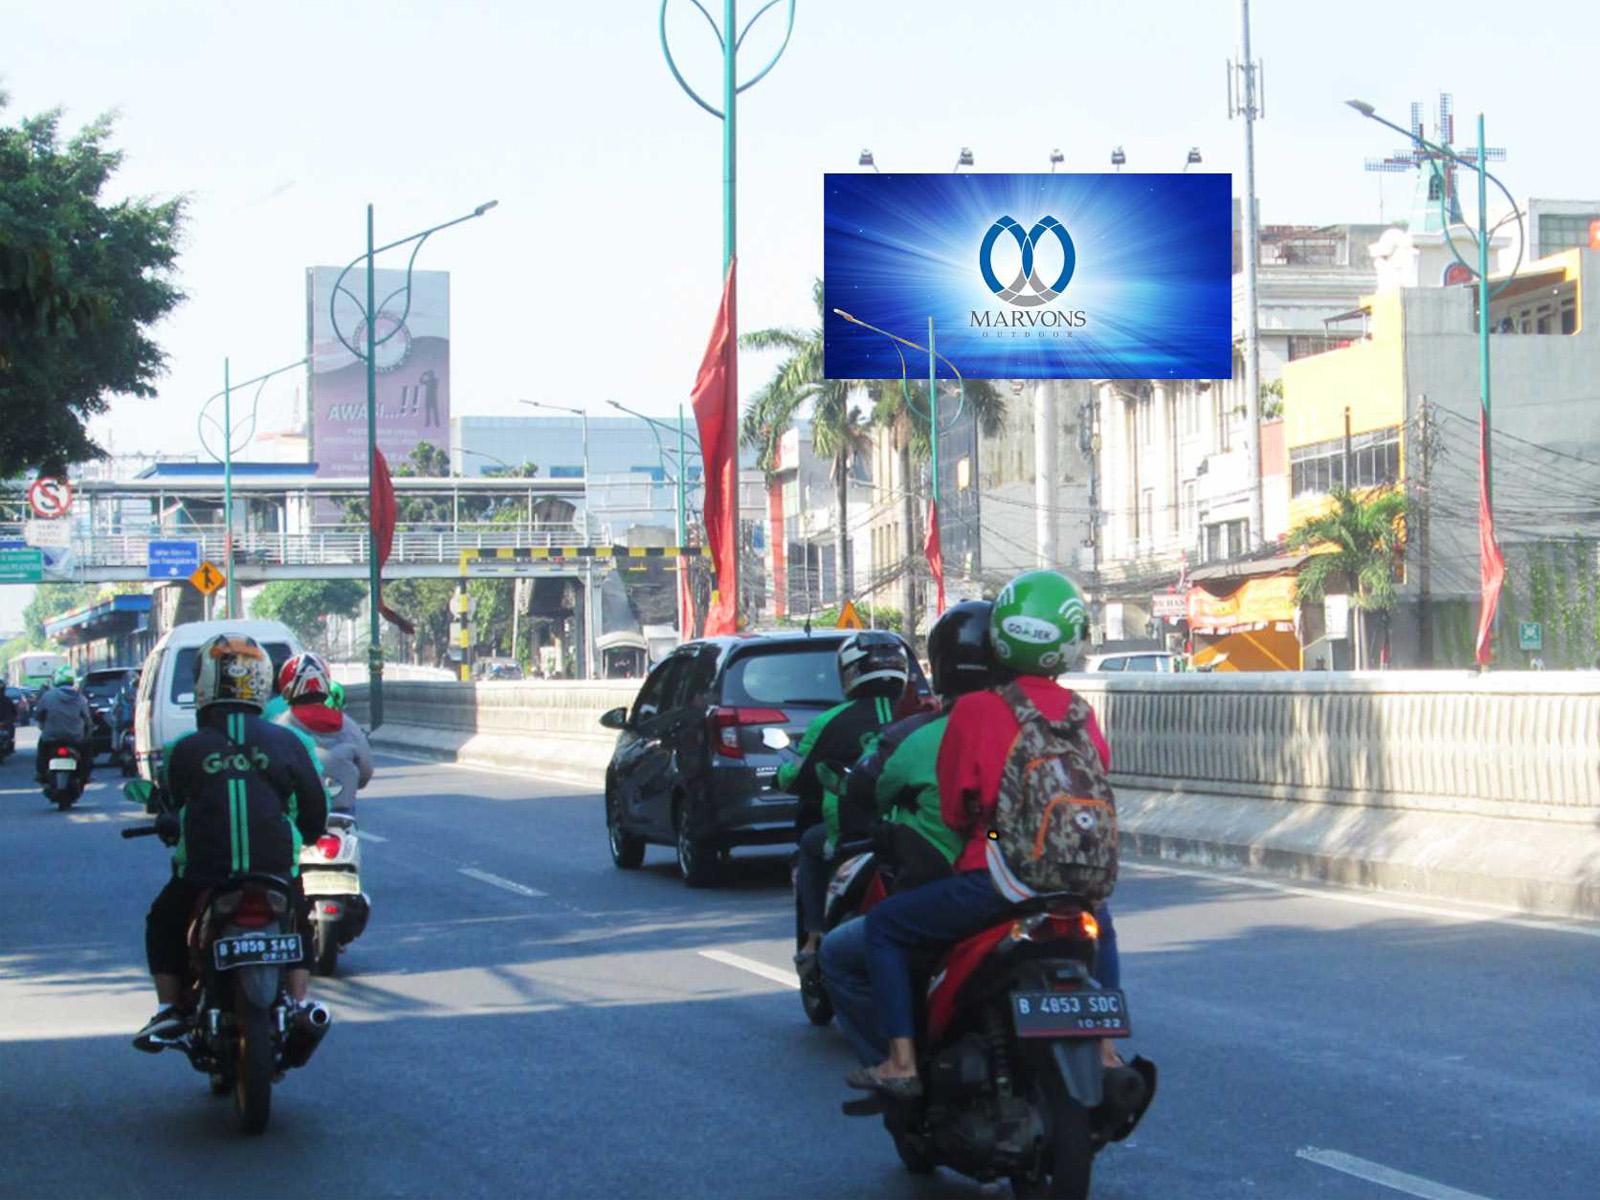 PT. Marvons Media Utama - Mampang Giant (MV 053) - 6m x 12m x 1 mk Horizontal